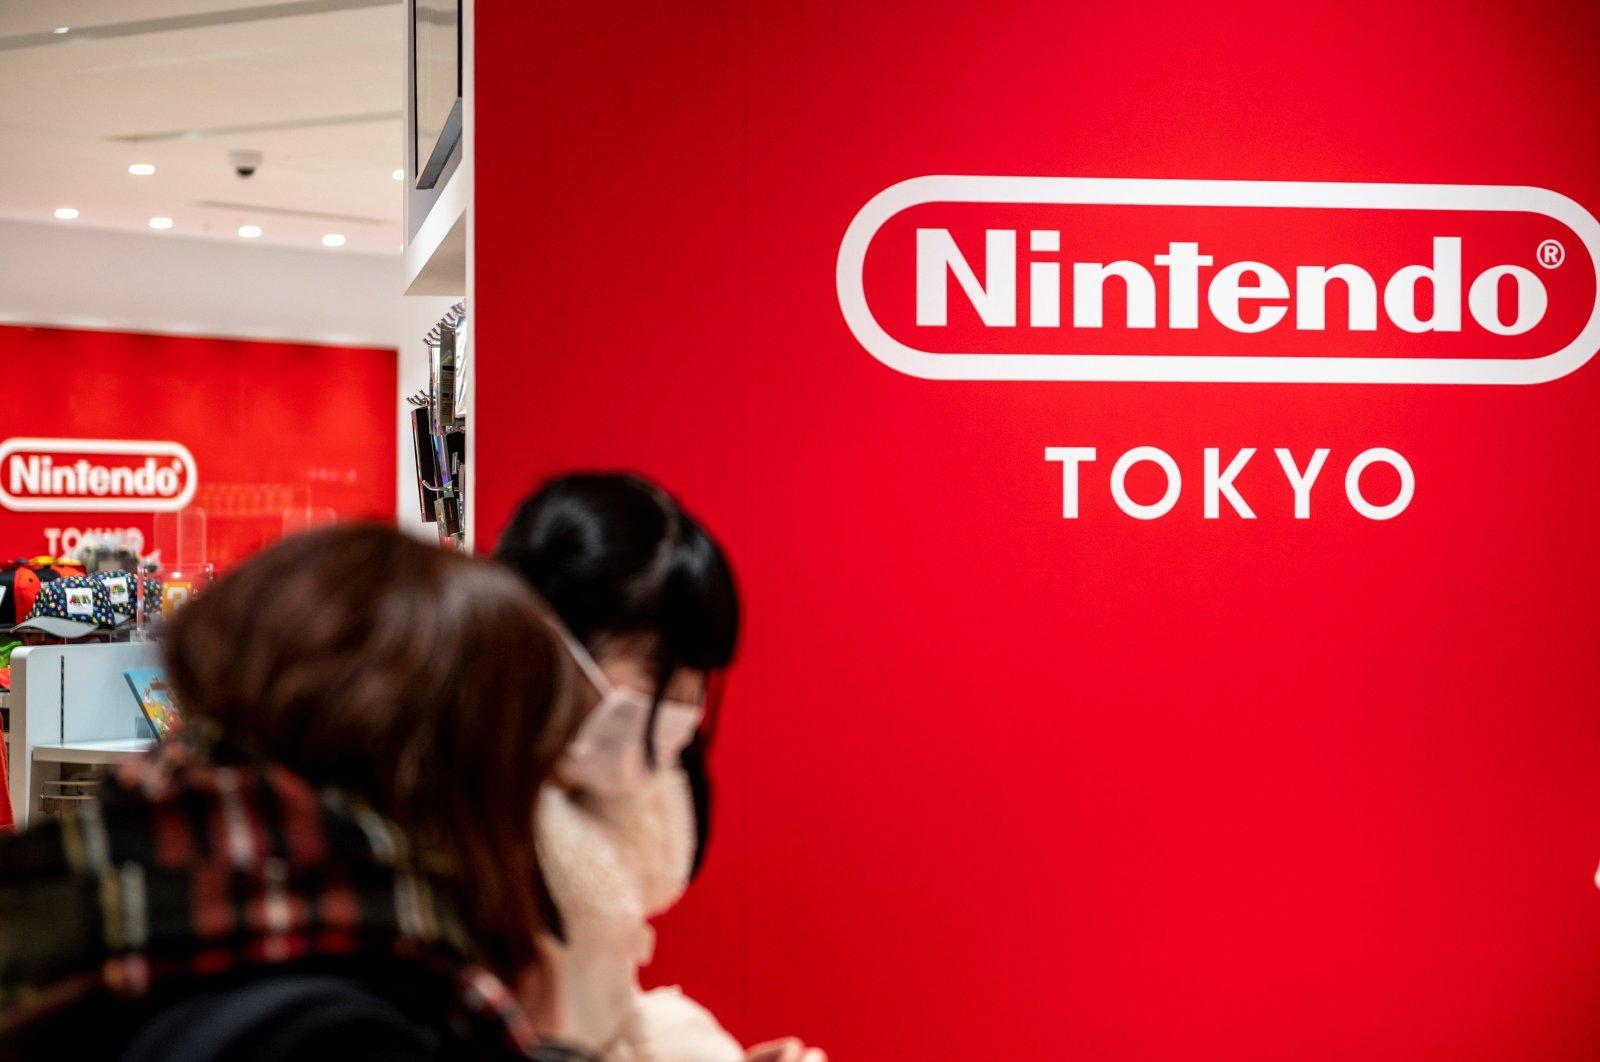 Customers shop at a Nintendo store in Tokyo, Japan, Feb. 1, 2021. (AFP Photo)